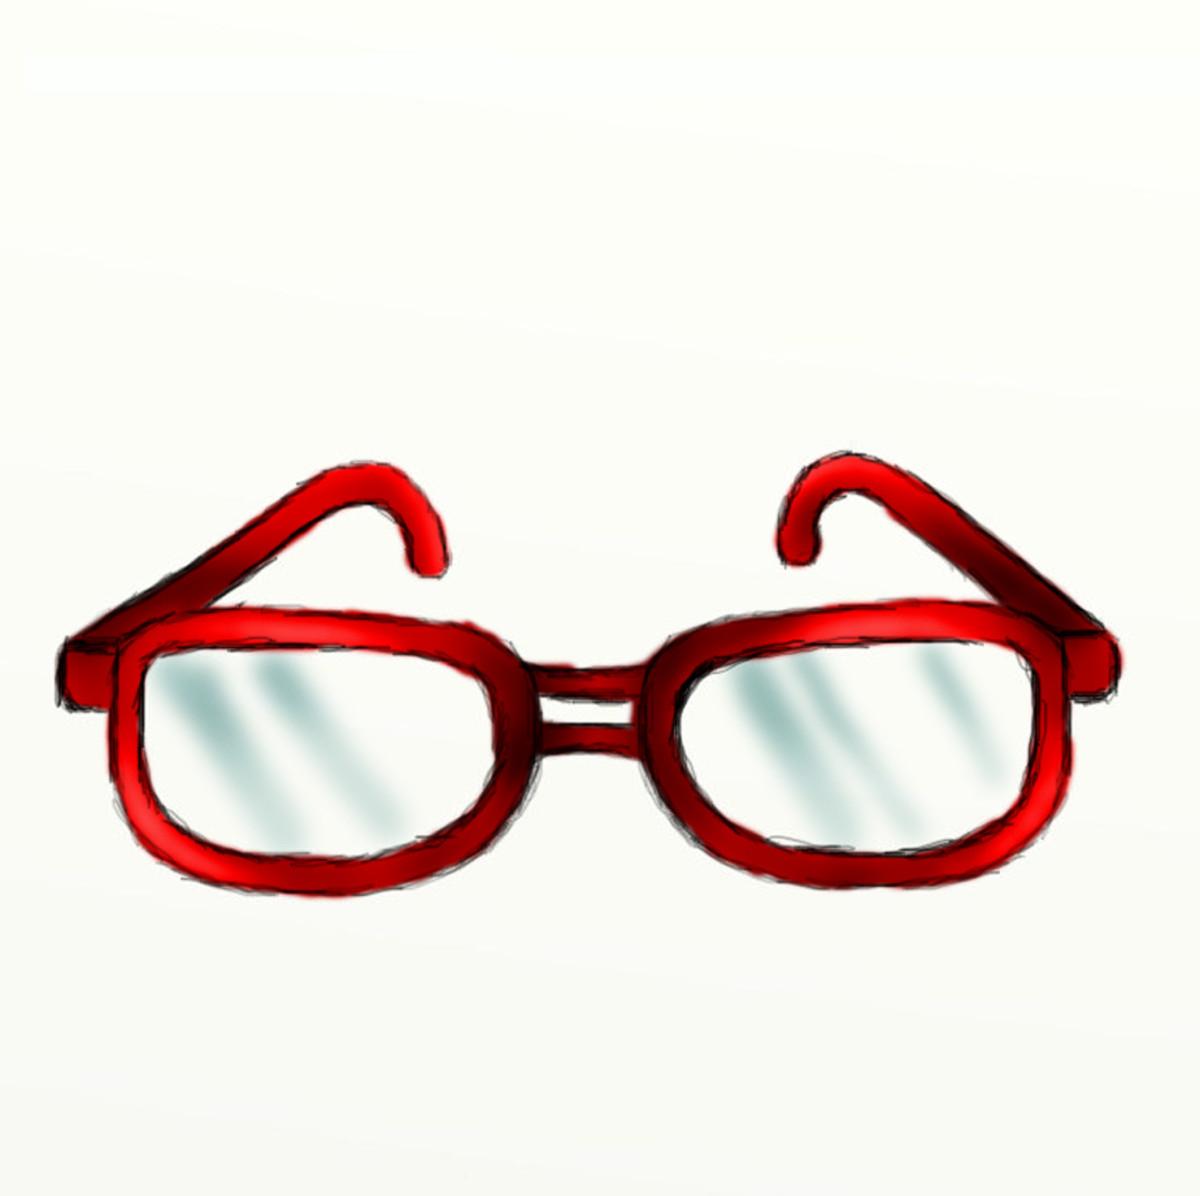 how to draw eye glasses feltmagnet bridges clipart and graphics bridge clipart images